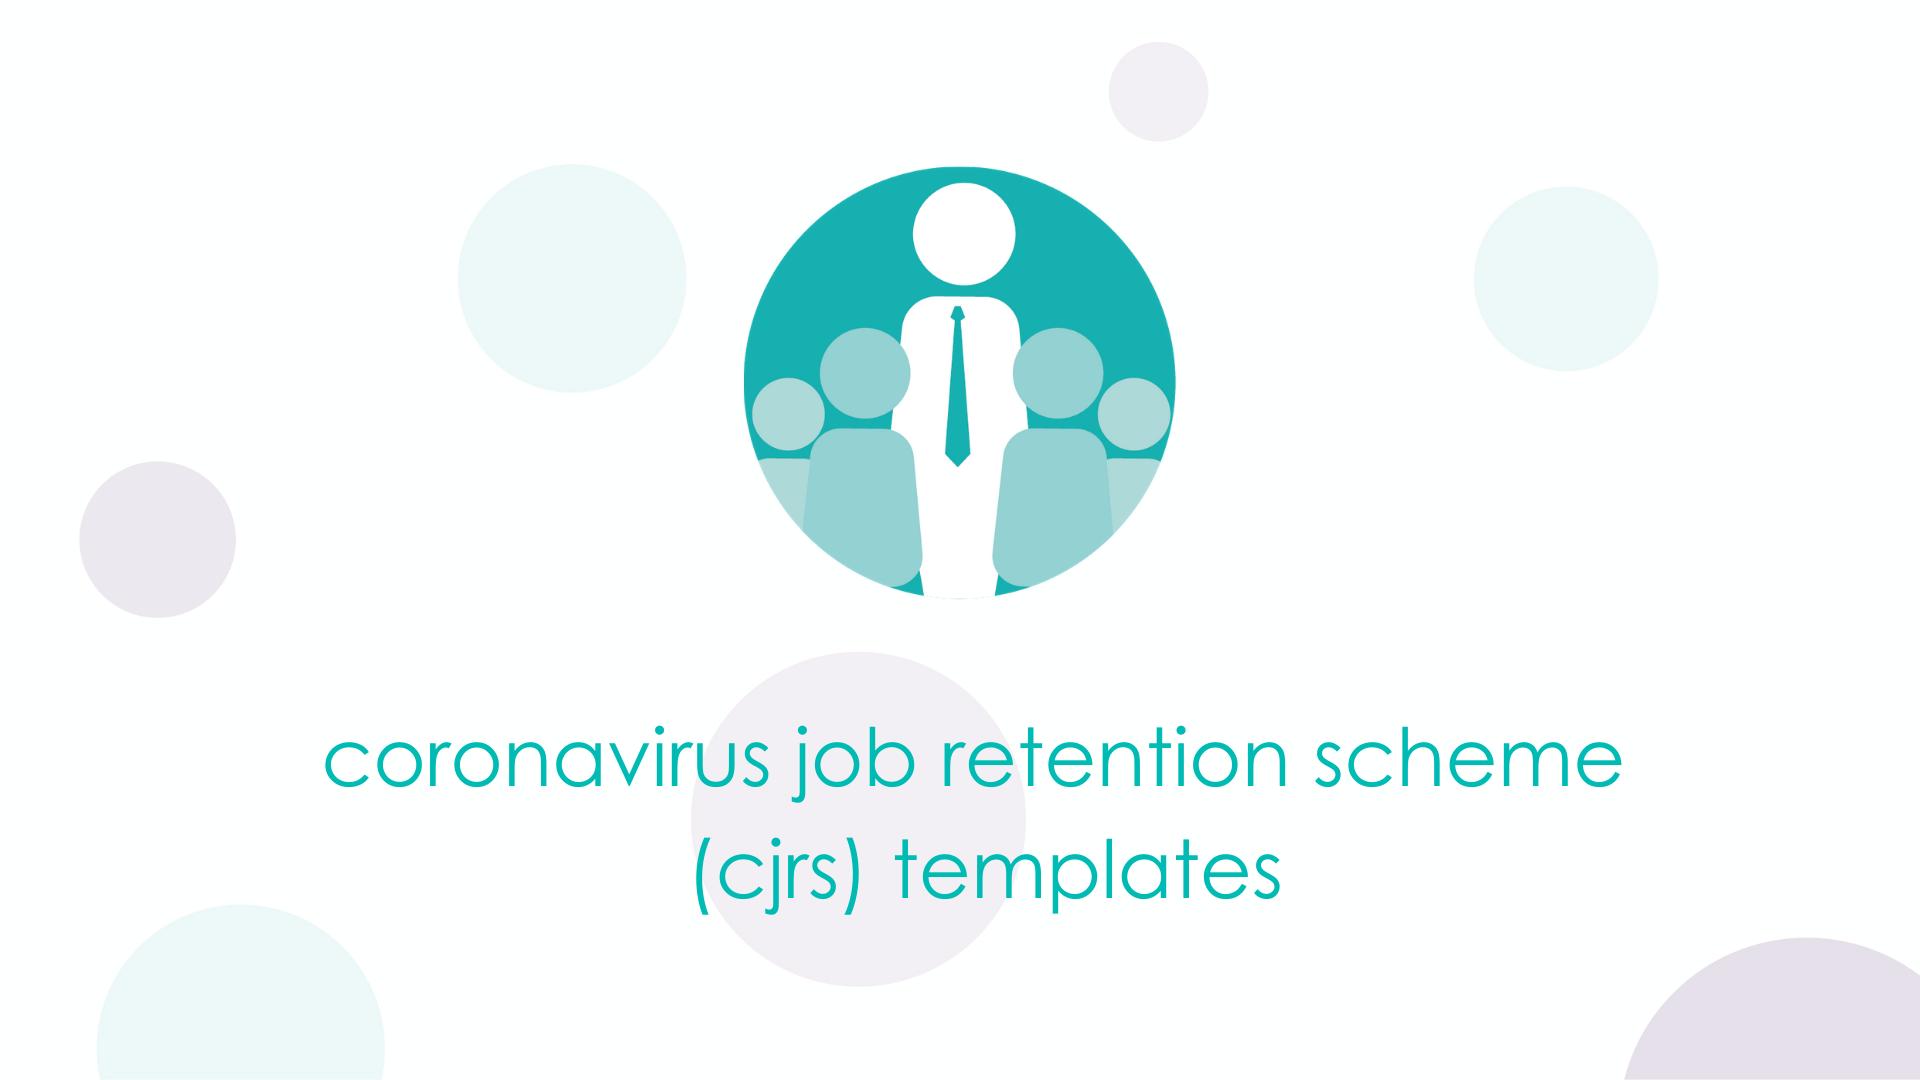 Coronavirus Job Retention Scheme (CJRS) templates